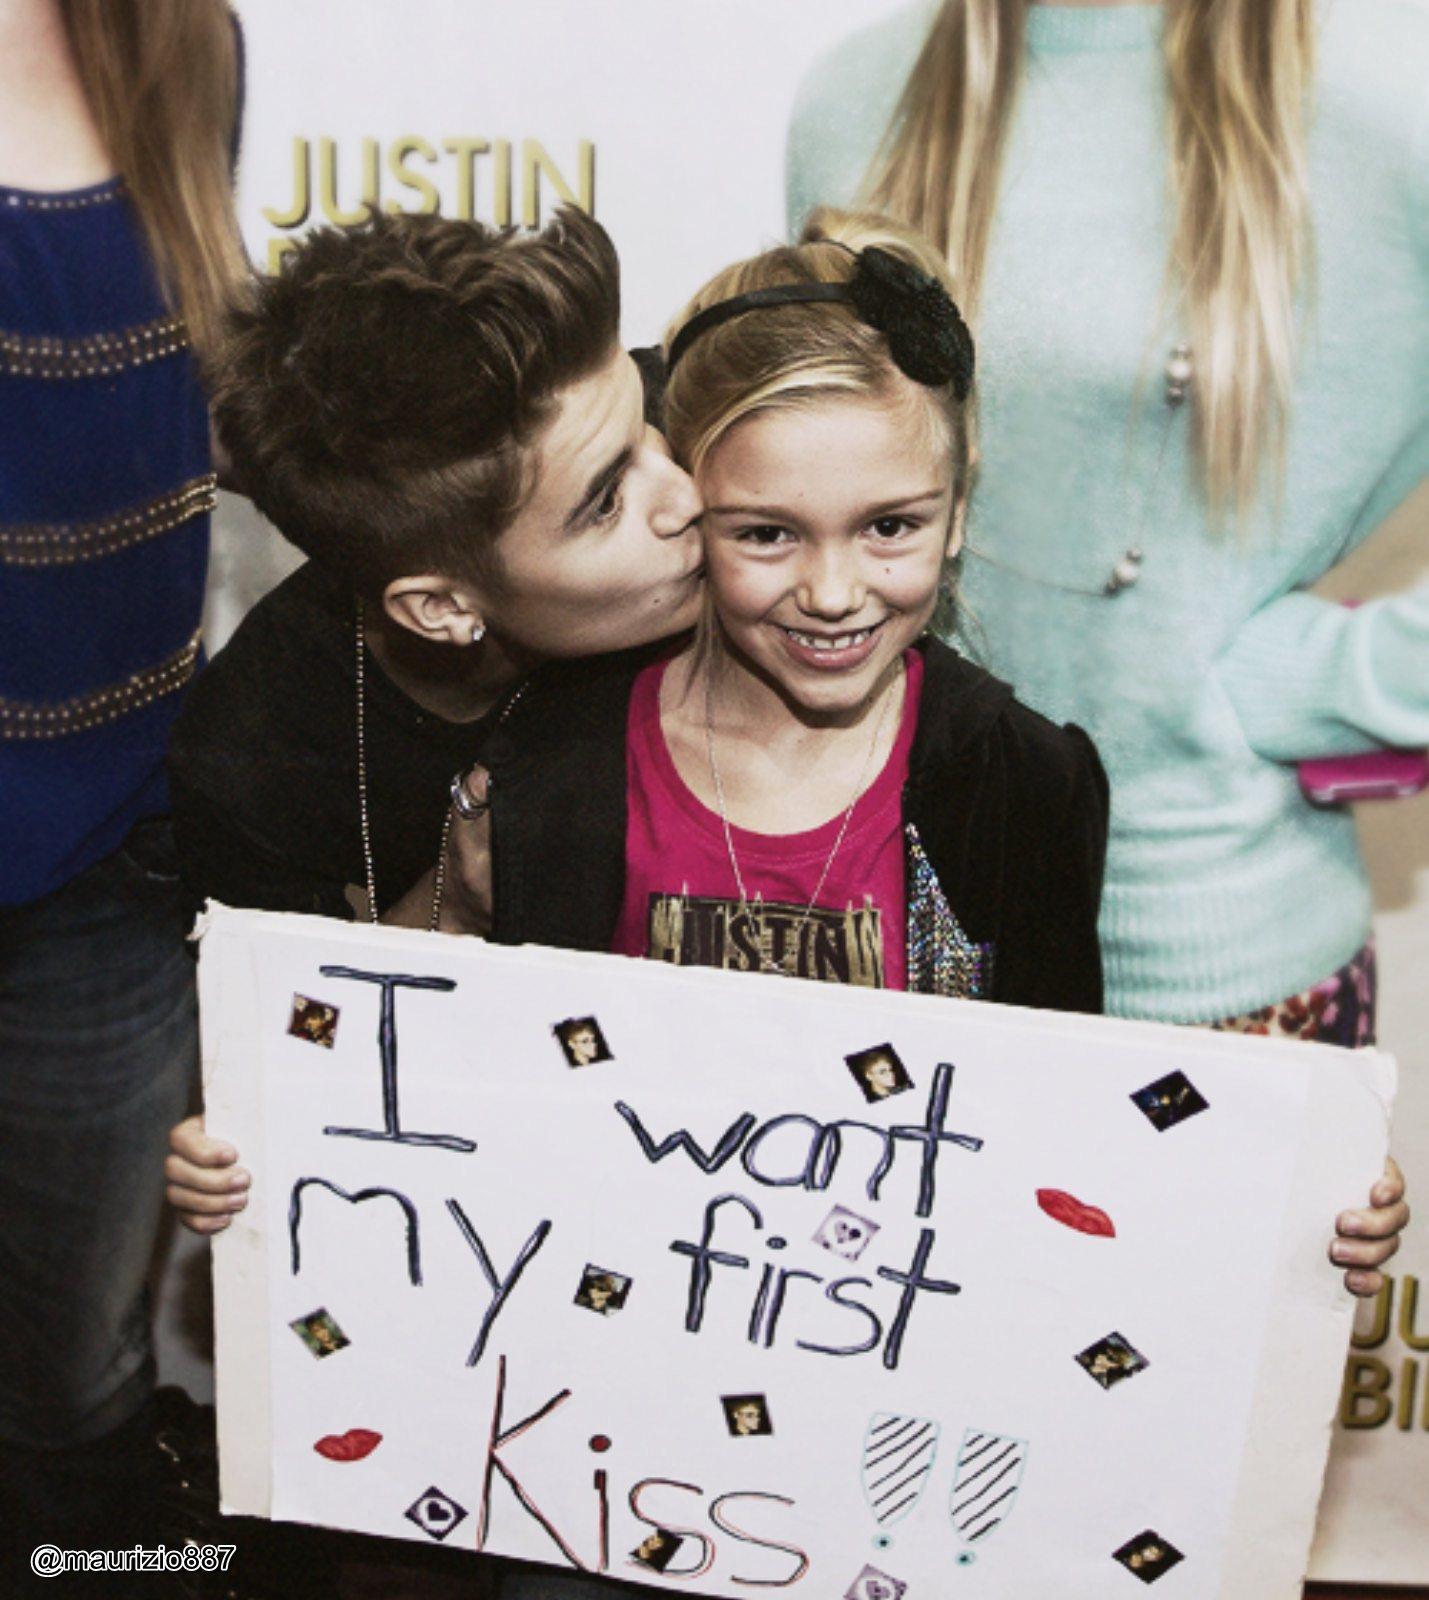 Justin bieber images justinmeet greeti want my first kiss hd justin bieber images justinmeet greeti want my first kiss hd wallpaper and background photos m4hsunfo